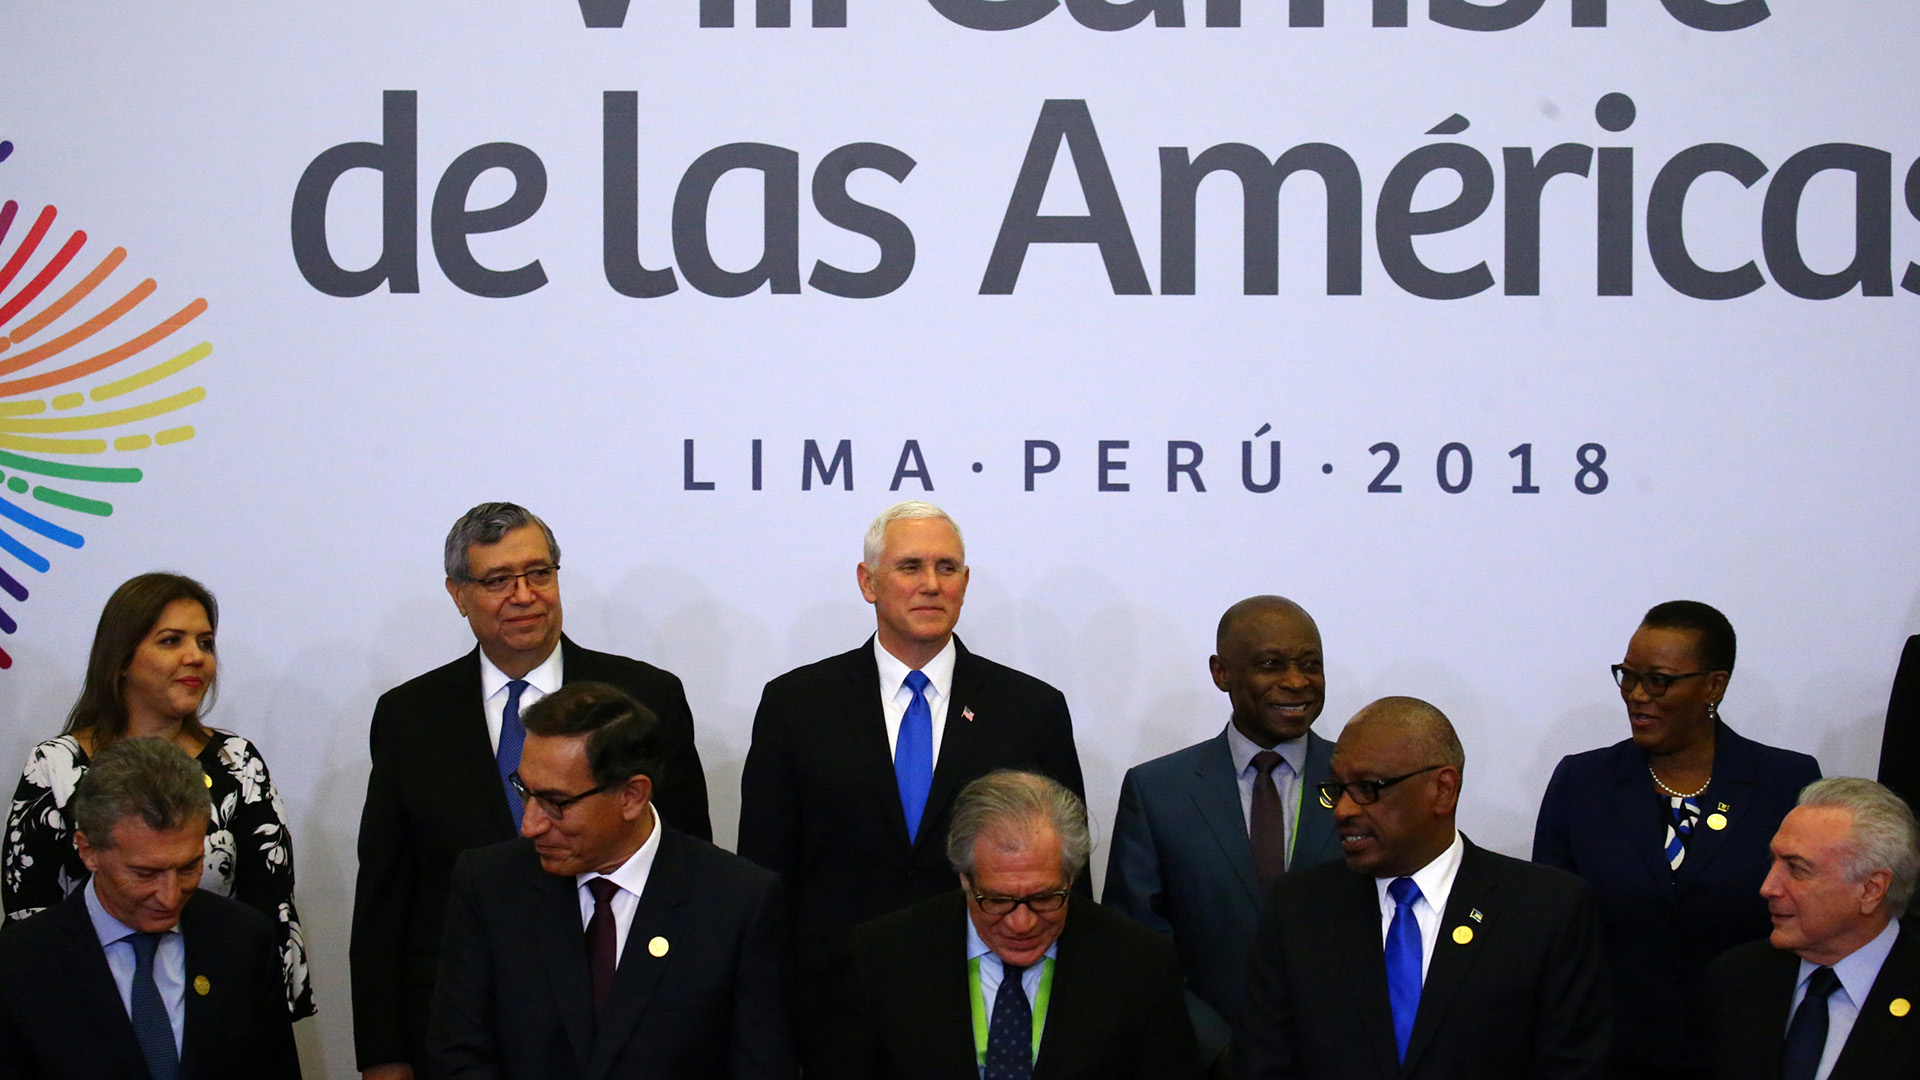 Mike Pence asistió a la Cumbre de las Américas ante la ausencia de Donald Trump(REUTERS)